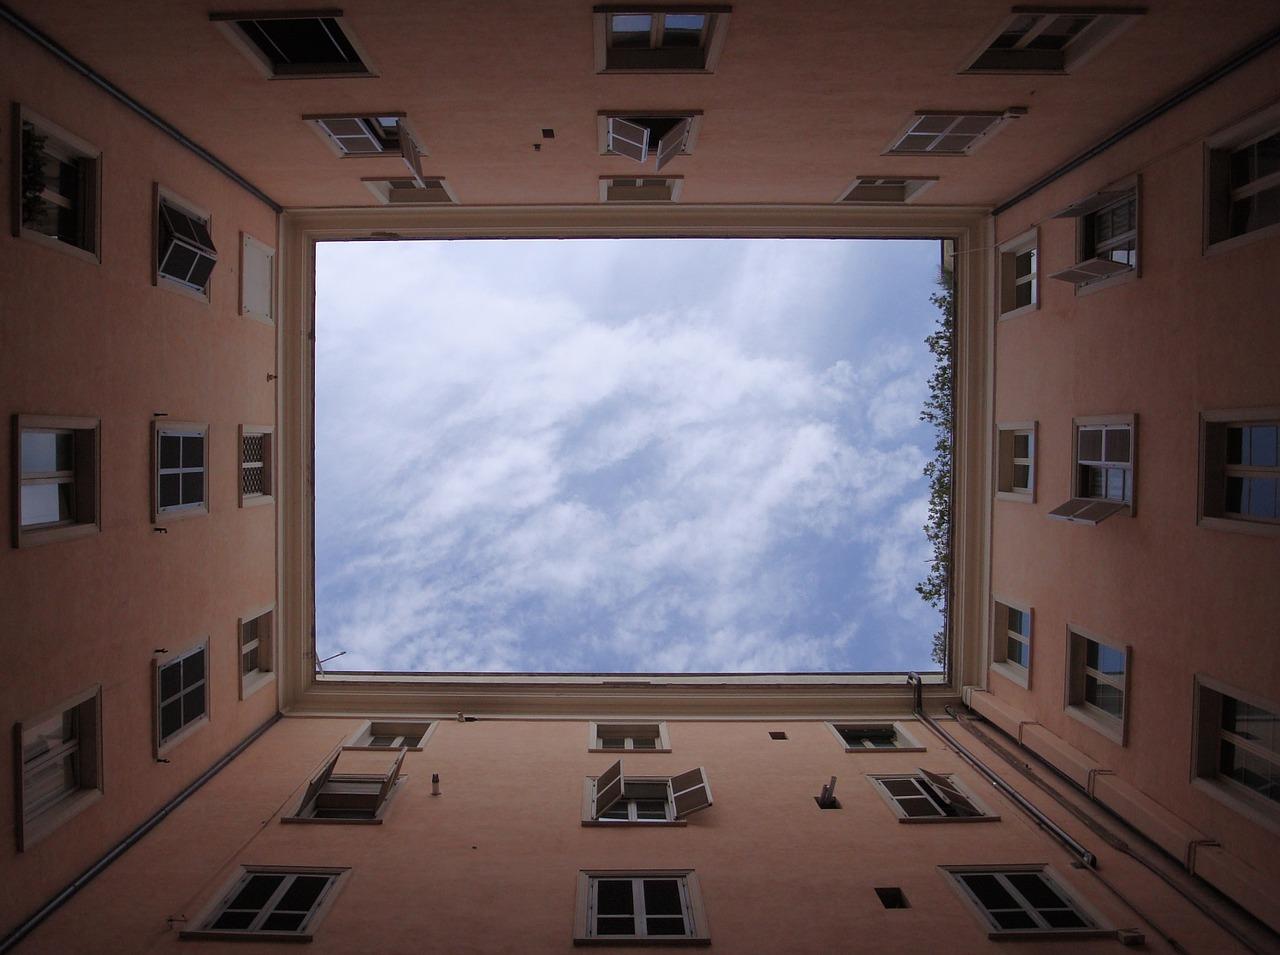 ventana-mallorquina